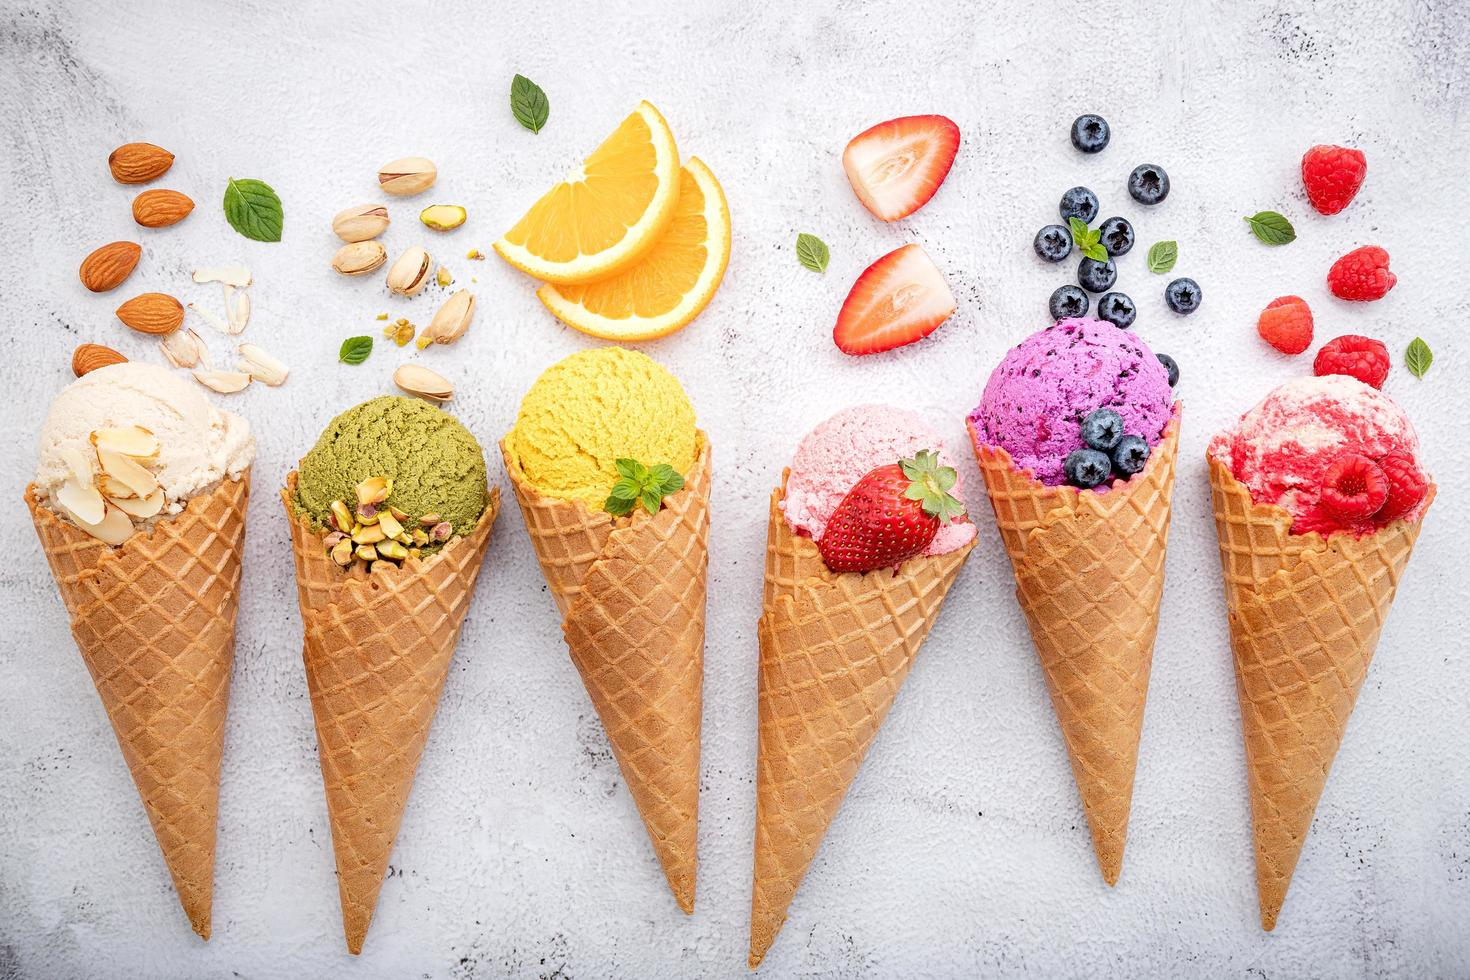 Fruit flavored ice cream photo